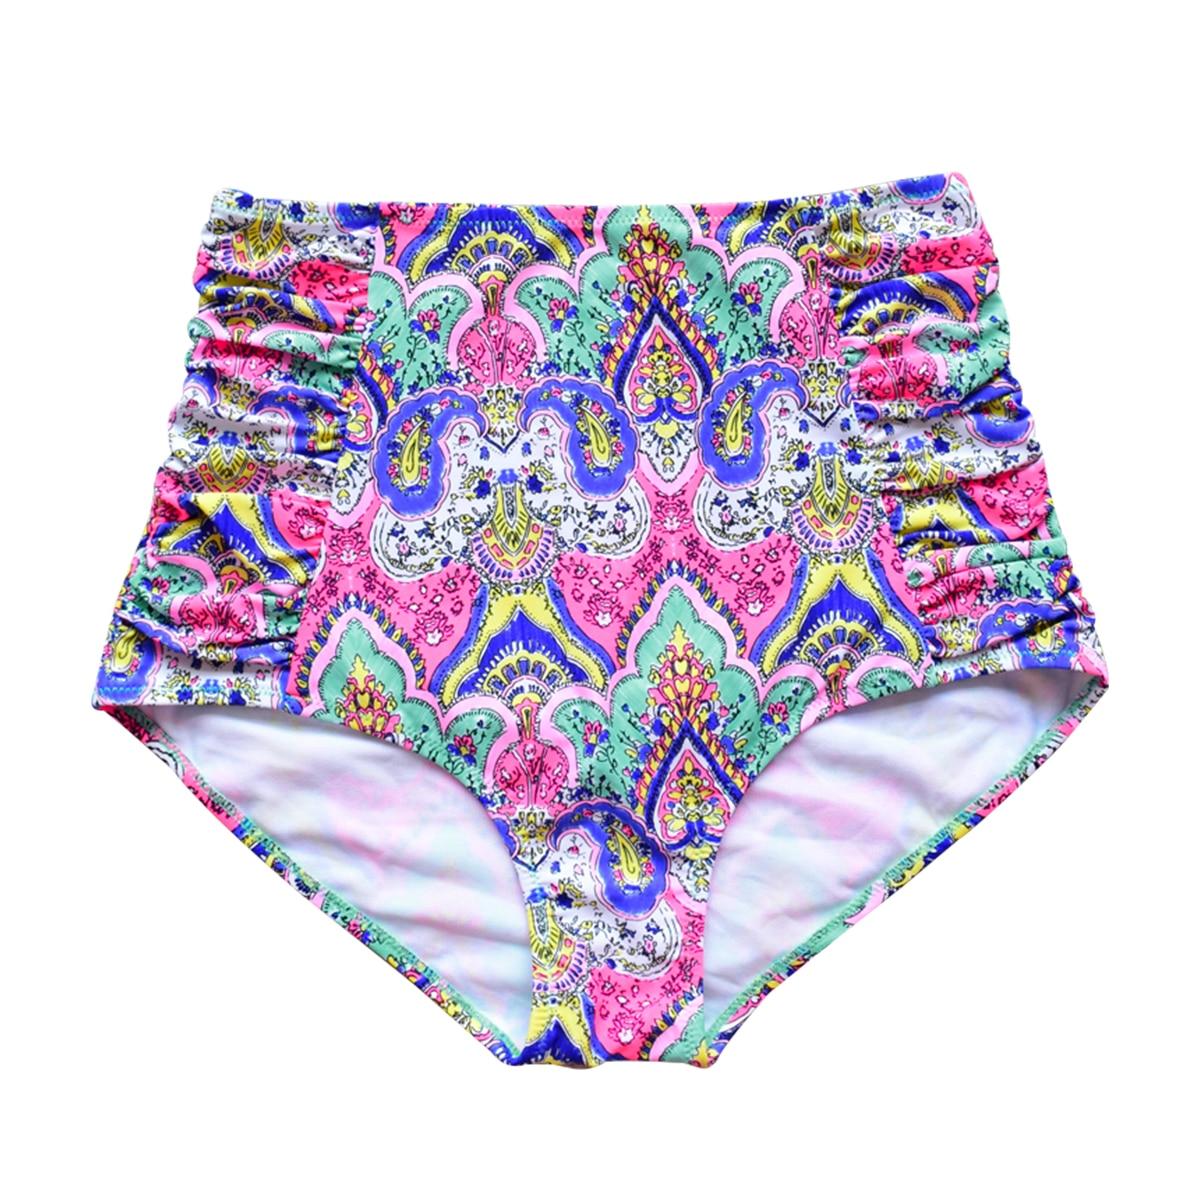 New Arrival High Waist Swim Trunks Bikini Bottoms Women Beach Print Floral Swimwear underwear Swimming Shorts Briefs